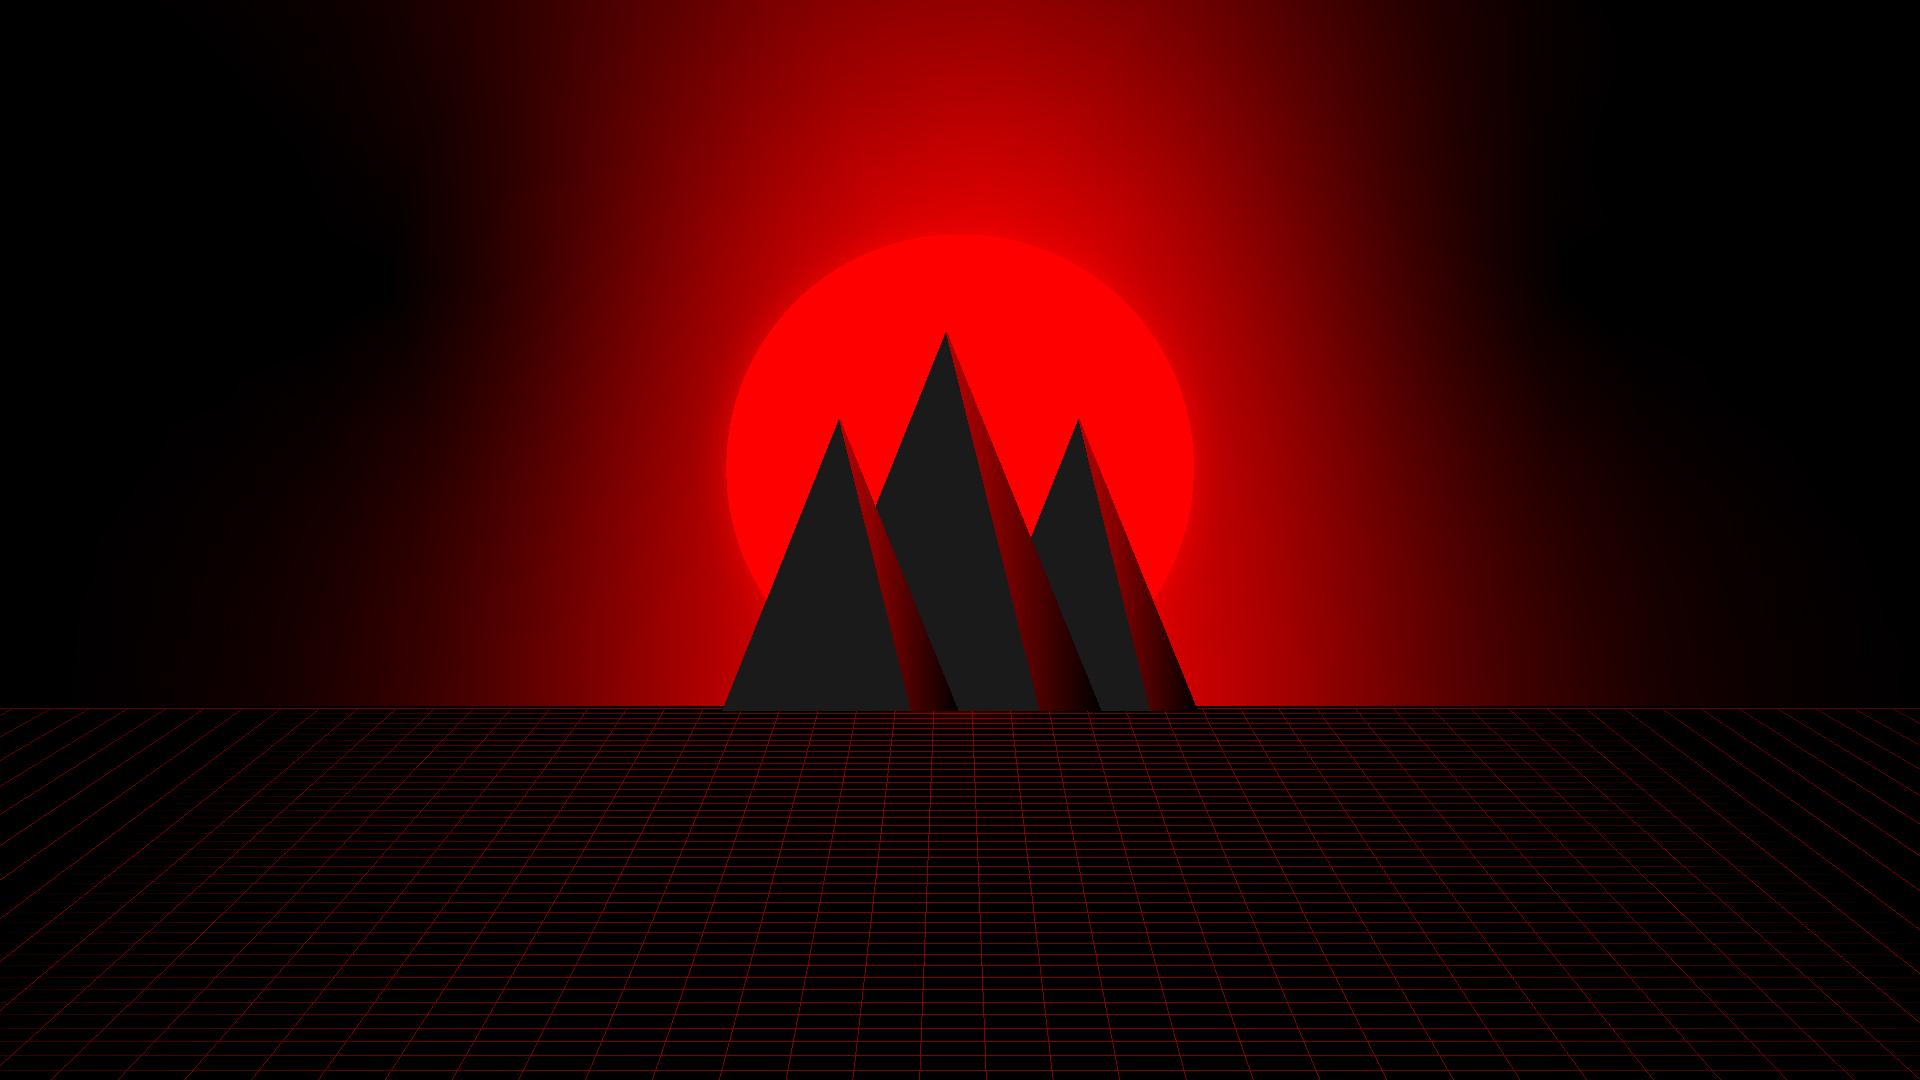 Wallpaper Red Hd Synthwave 4k 8k Heroscreen Cool Wallpapers